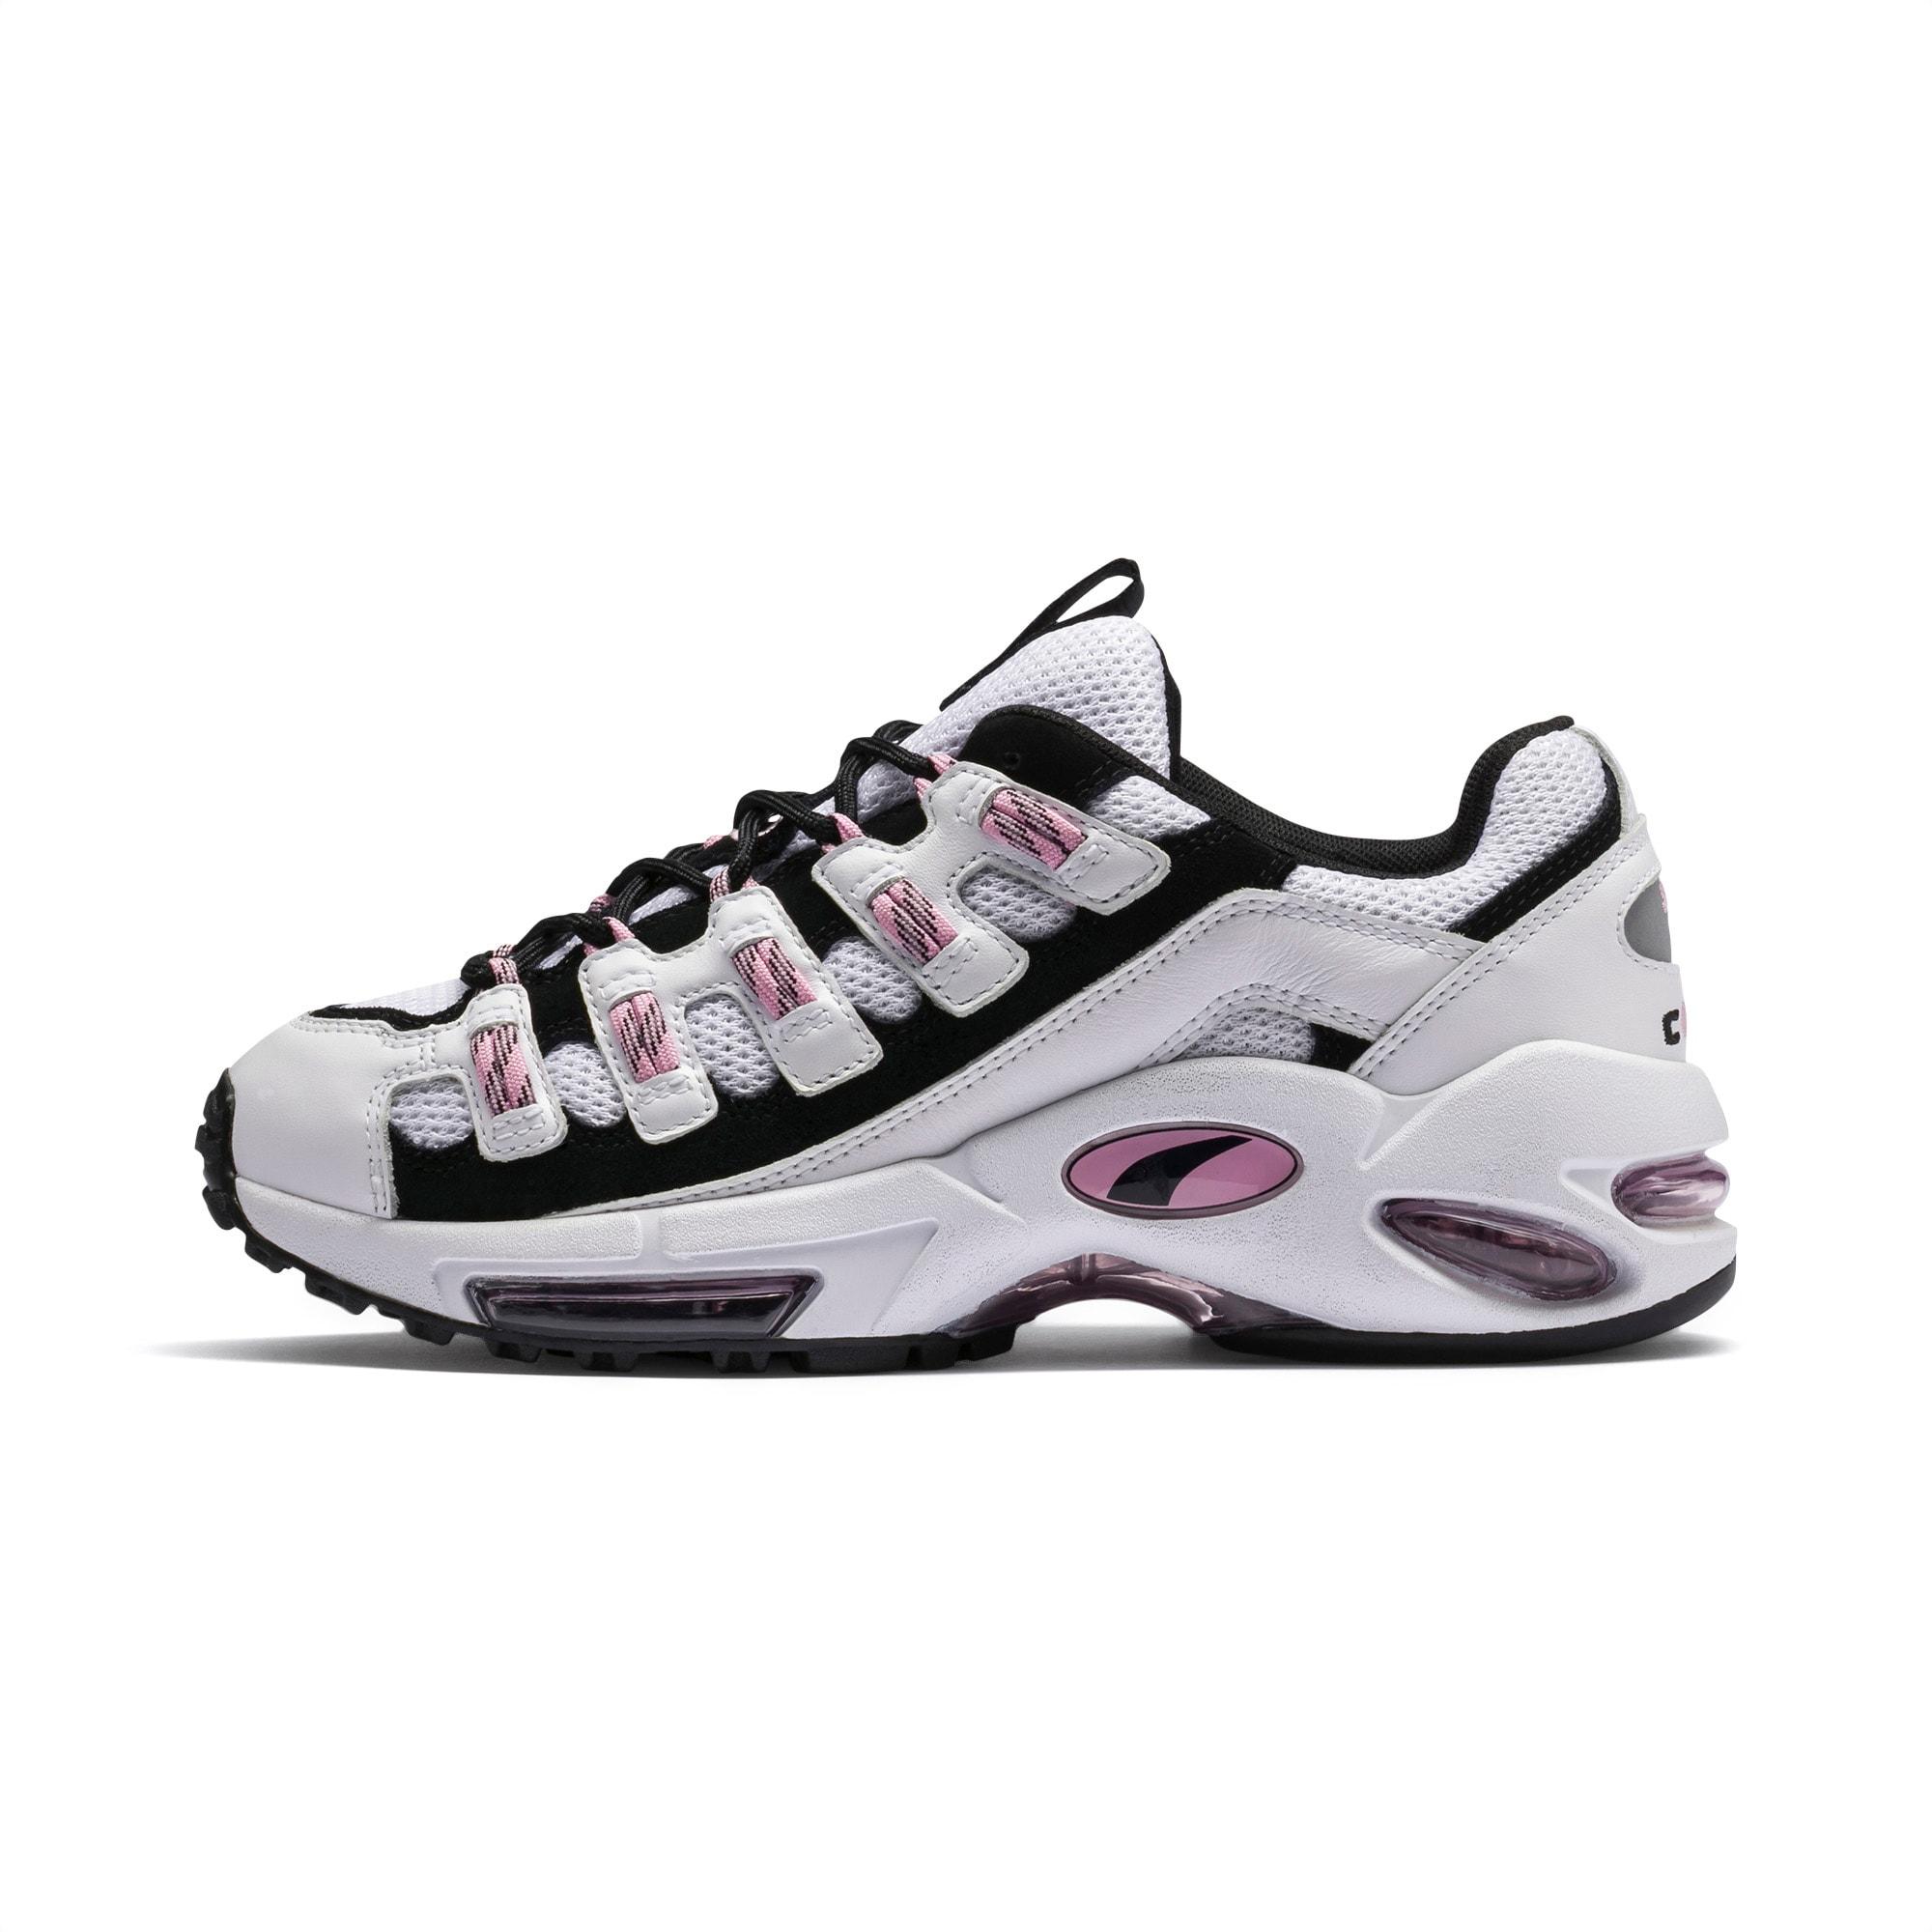 Cell Endura Trainers   05   PUMA Sneakers   PUMA